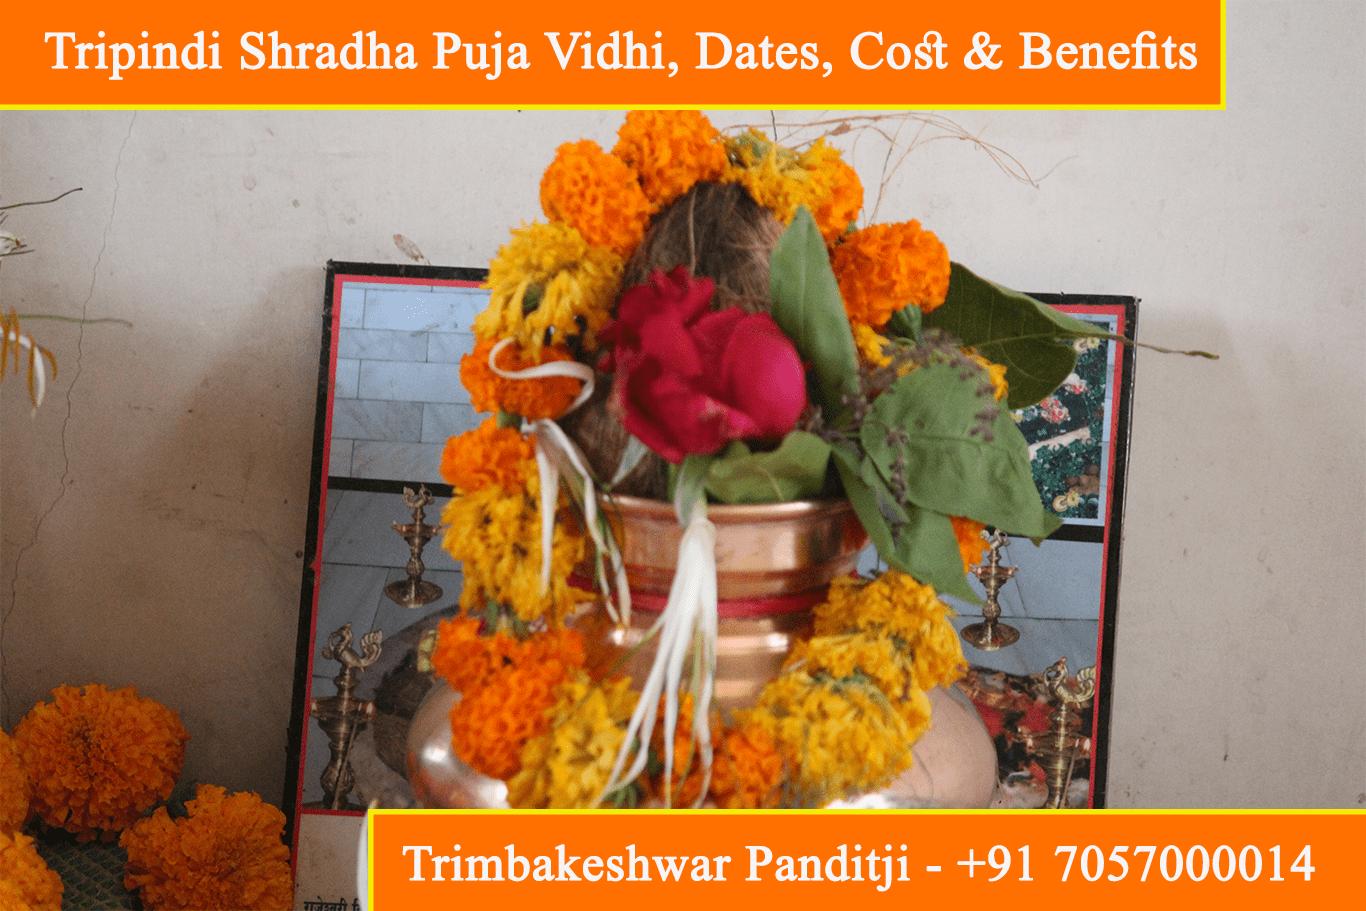 Tripindi Shradha Puja Vidhi, Dates, Cost & Benefits